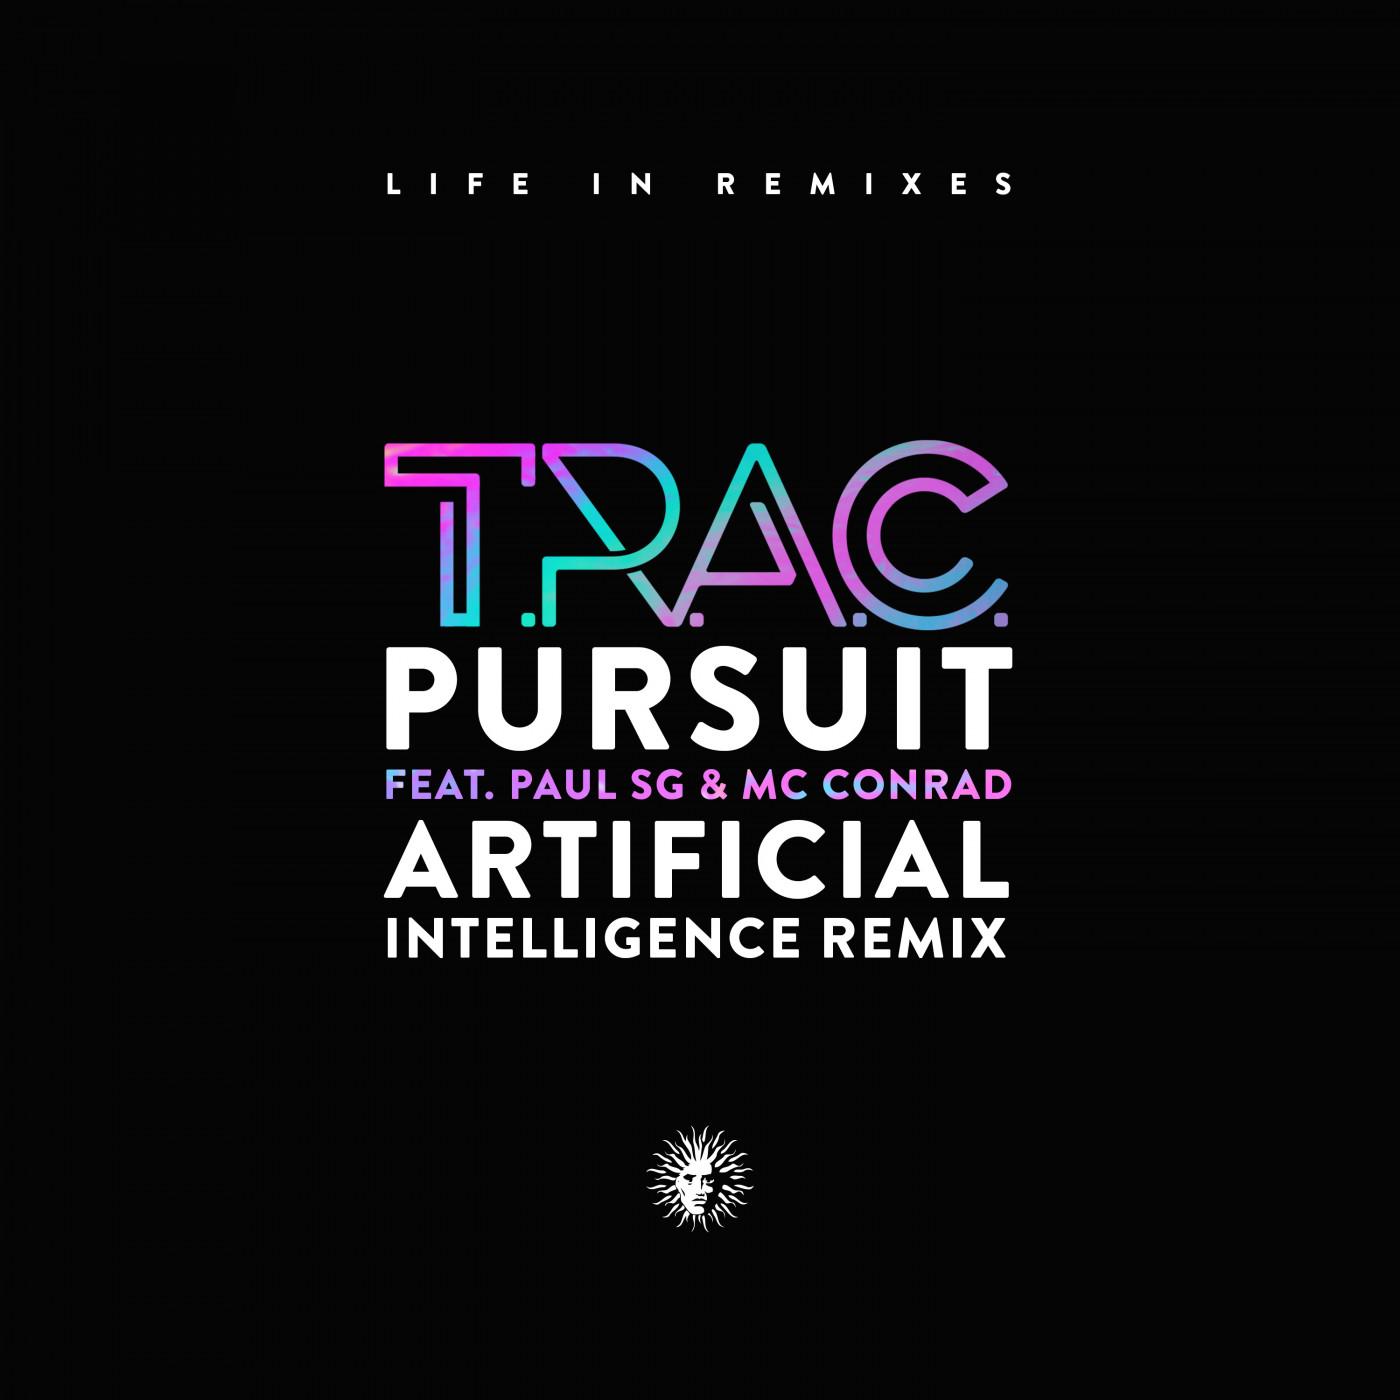 The Pursuit feat. Paul SG & MC Conrad (Artificial Intelligence Remix)